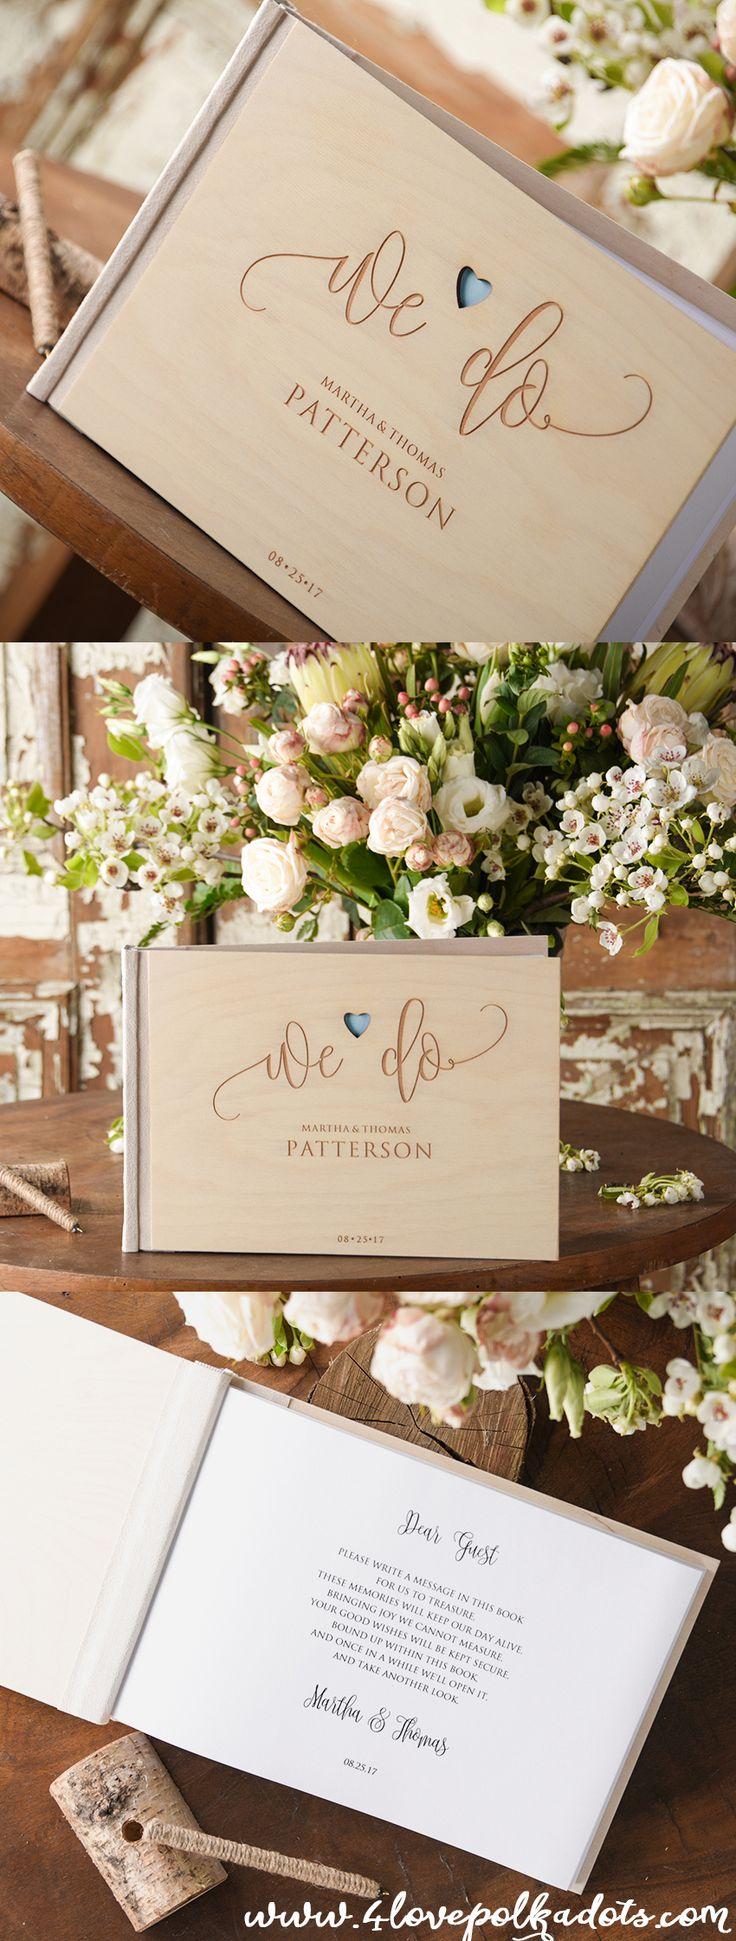 Boho Wedding Guest Book  #weddigguestbook